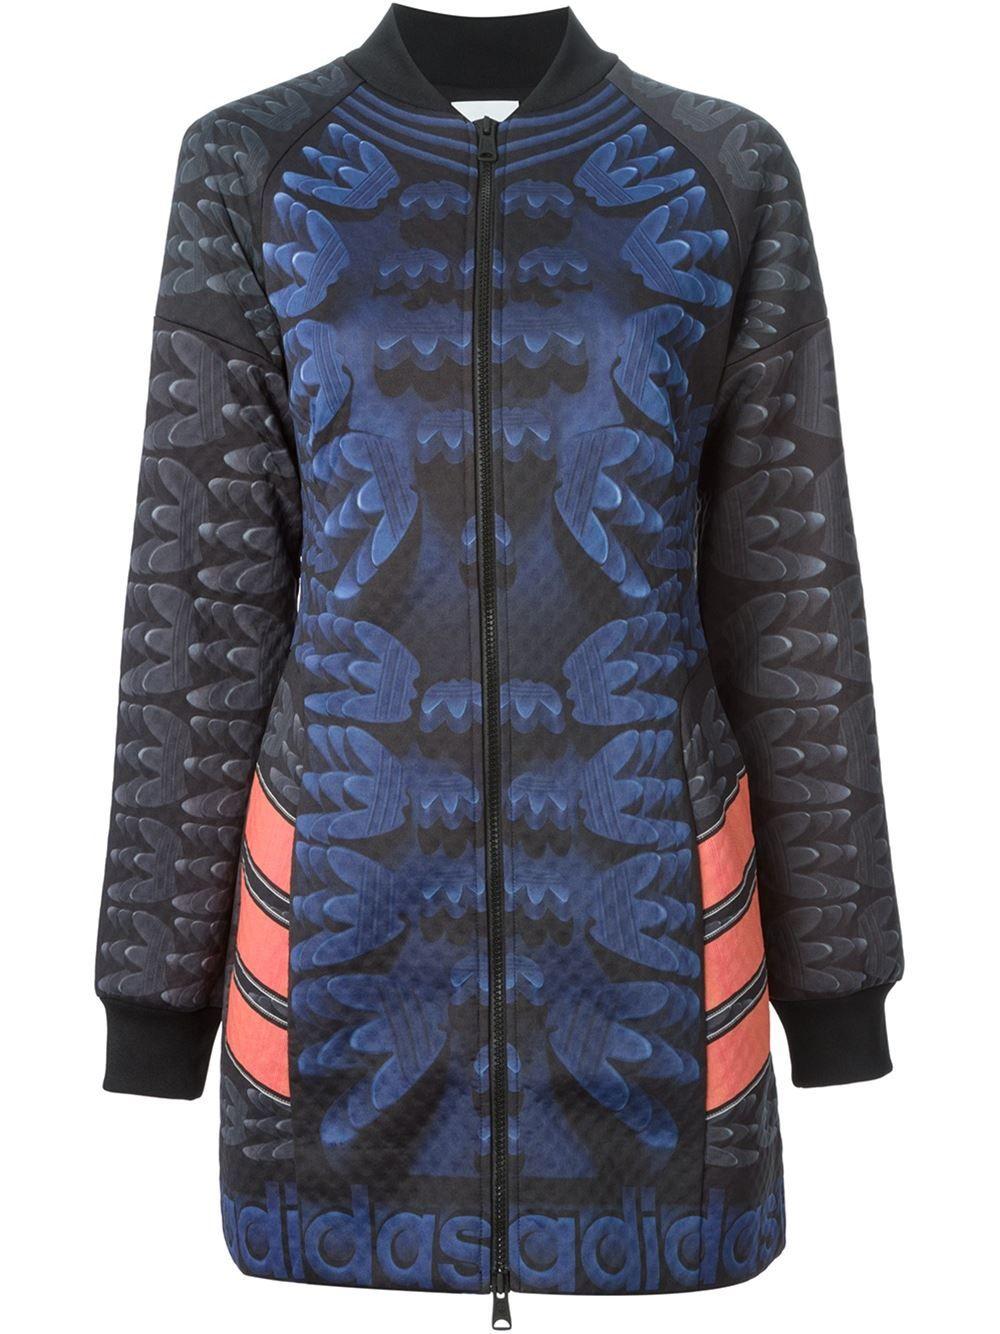 Store Voo Manteau X Mary Katrantzou Imprimé Originals Adidas q0fpg